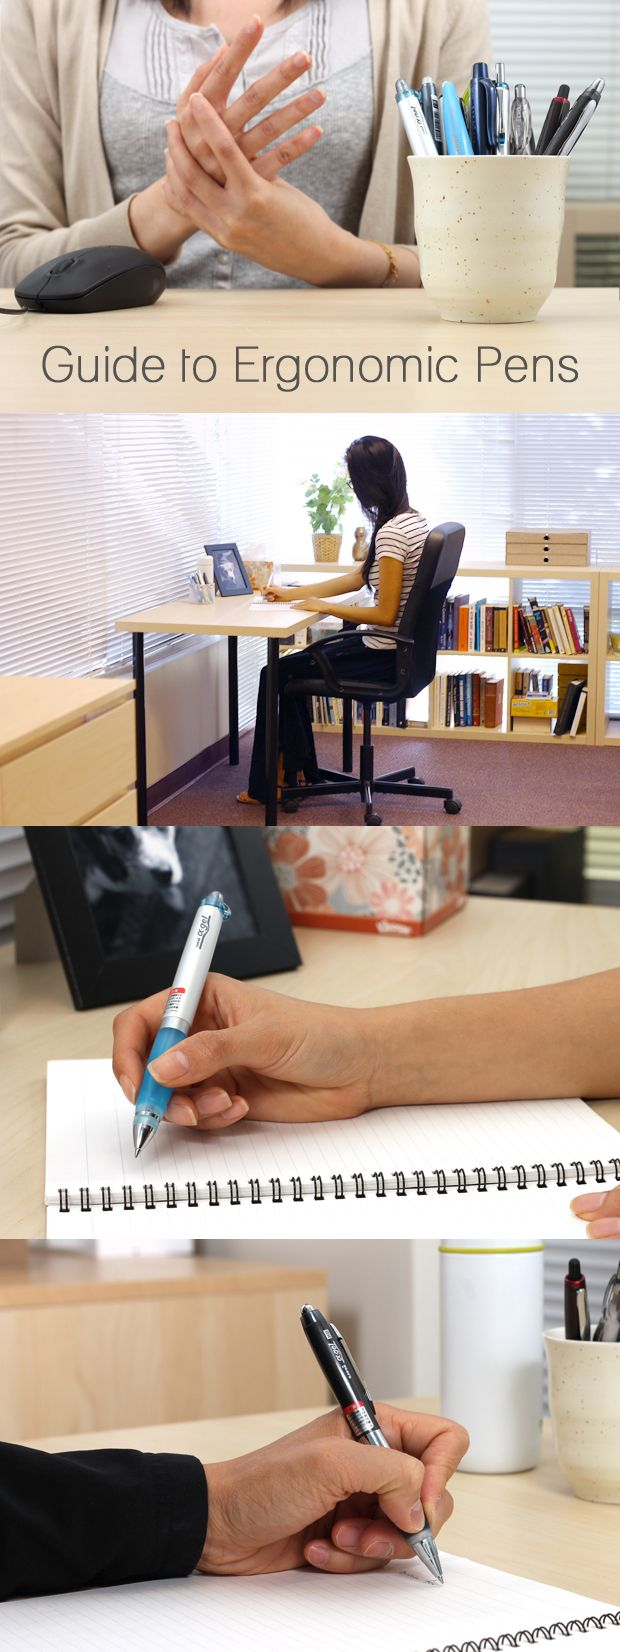 The key to fatigue-free writing is a good ergonomic pen. Check out our favorites here: http://www.jetpens.com/blog/ergonomic-pens/pt/84?utm_source=pinterest&utm_medium=social&utm_campaign=guides_and_tutorials